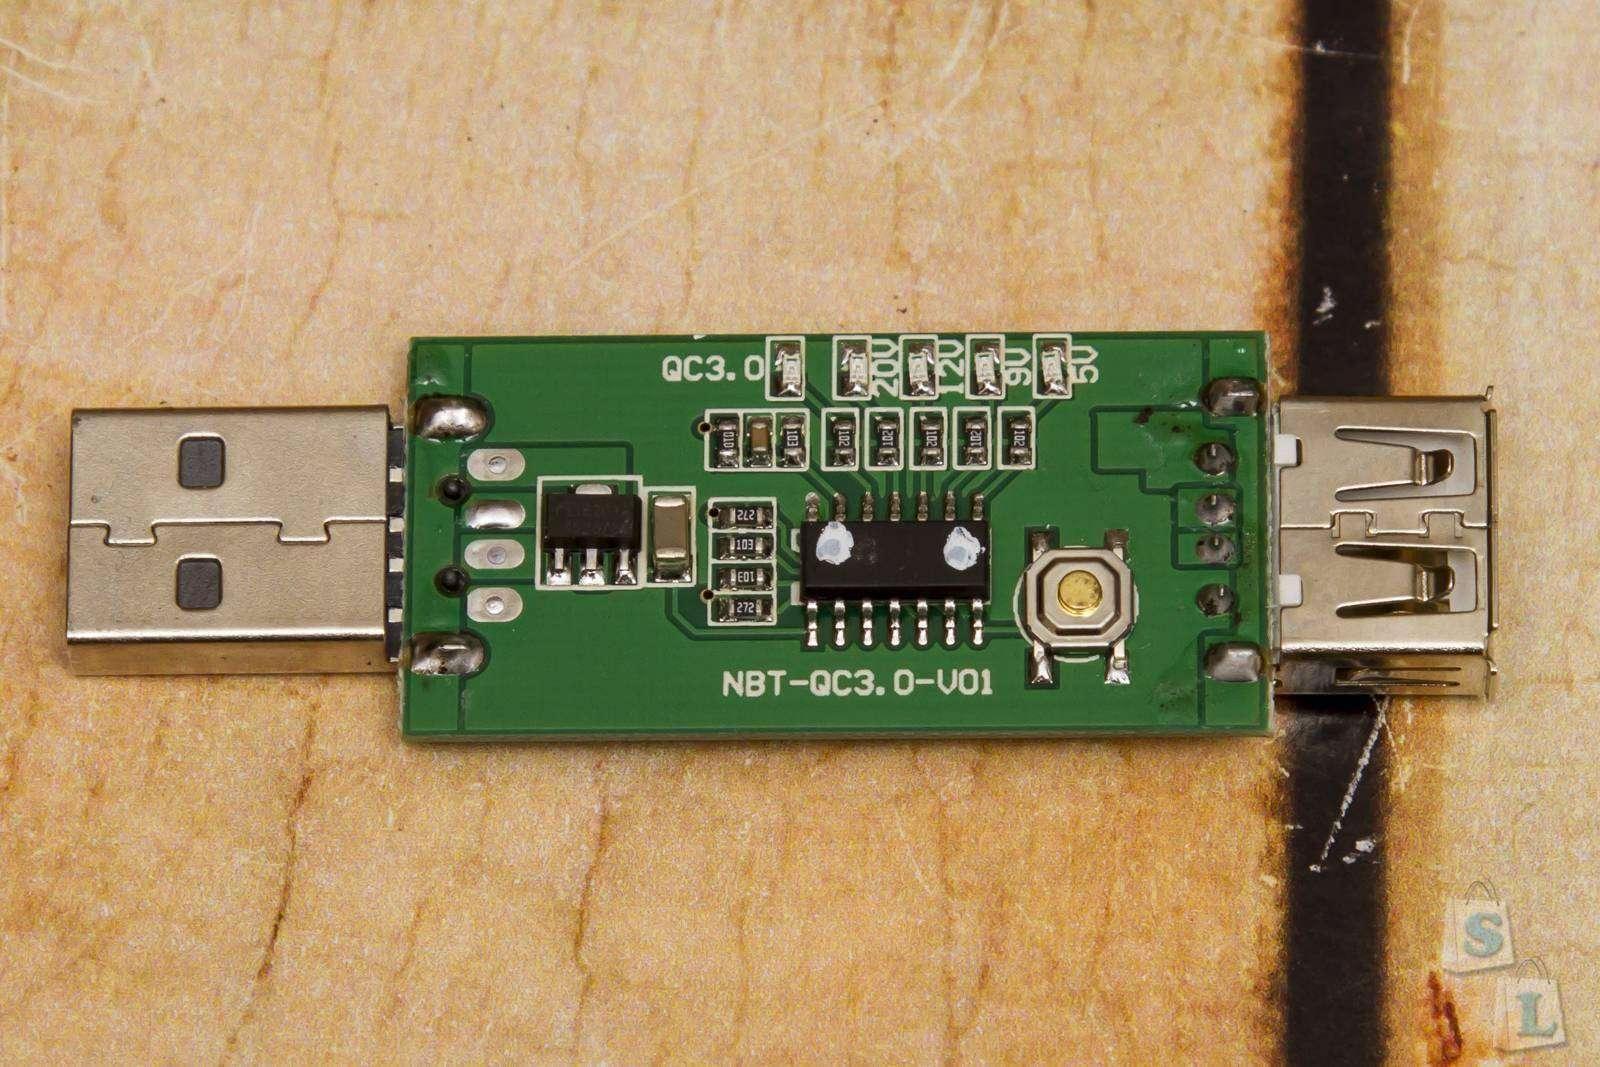 Aliexpress: USB триггер JUWEI для включения режимов Quick Charge 2.0, 3,0 - 5, 9, 12 и 20 Вольт